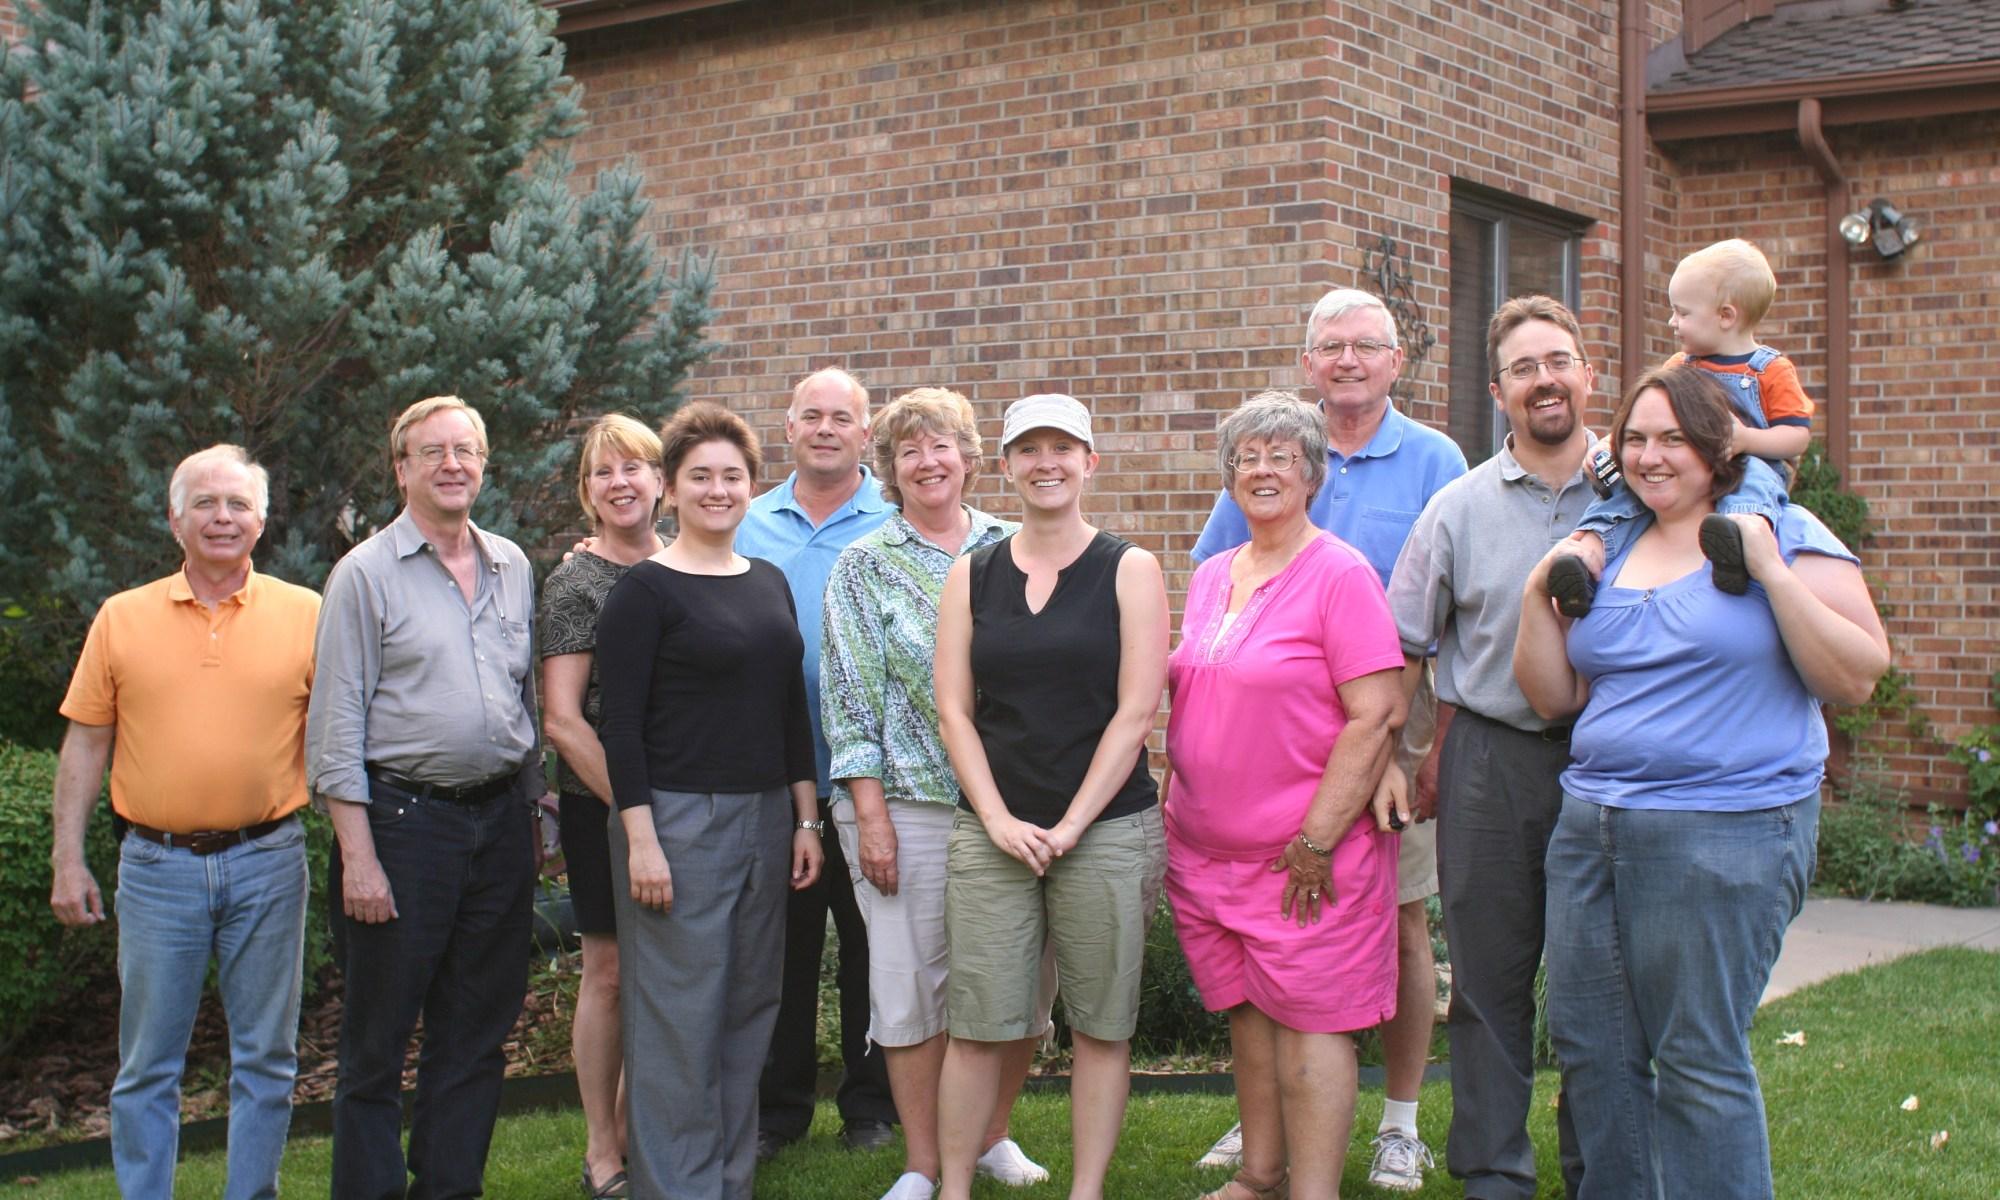 Goold Family reunion - Phil, Bud, Nancy, Stephanie, Jack, Betty, Melissa, Fran, Harold, Rob, Clare, and Spencer